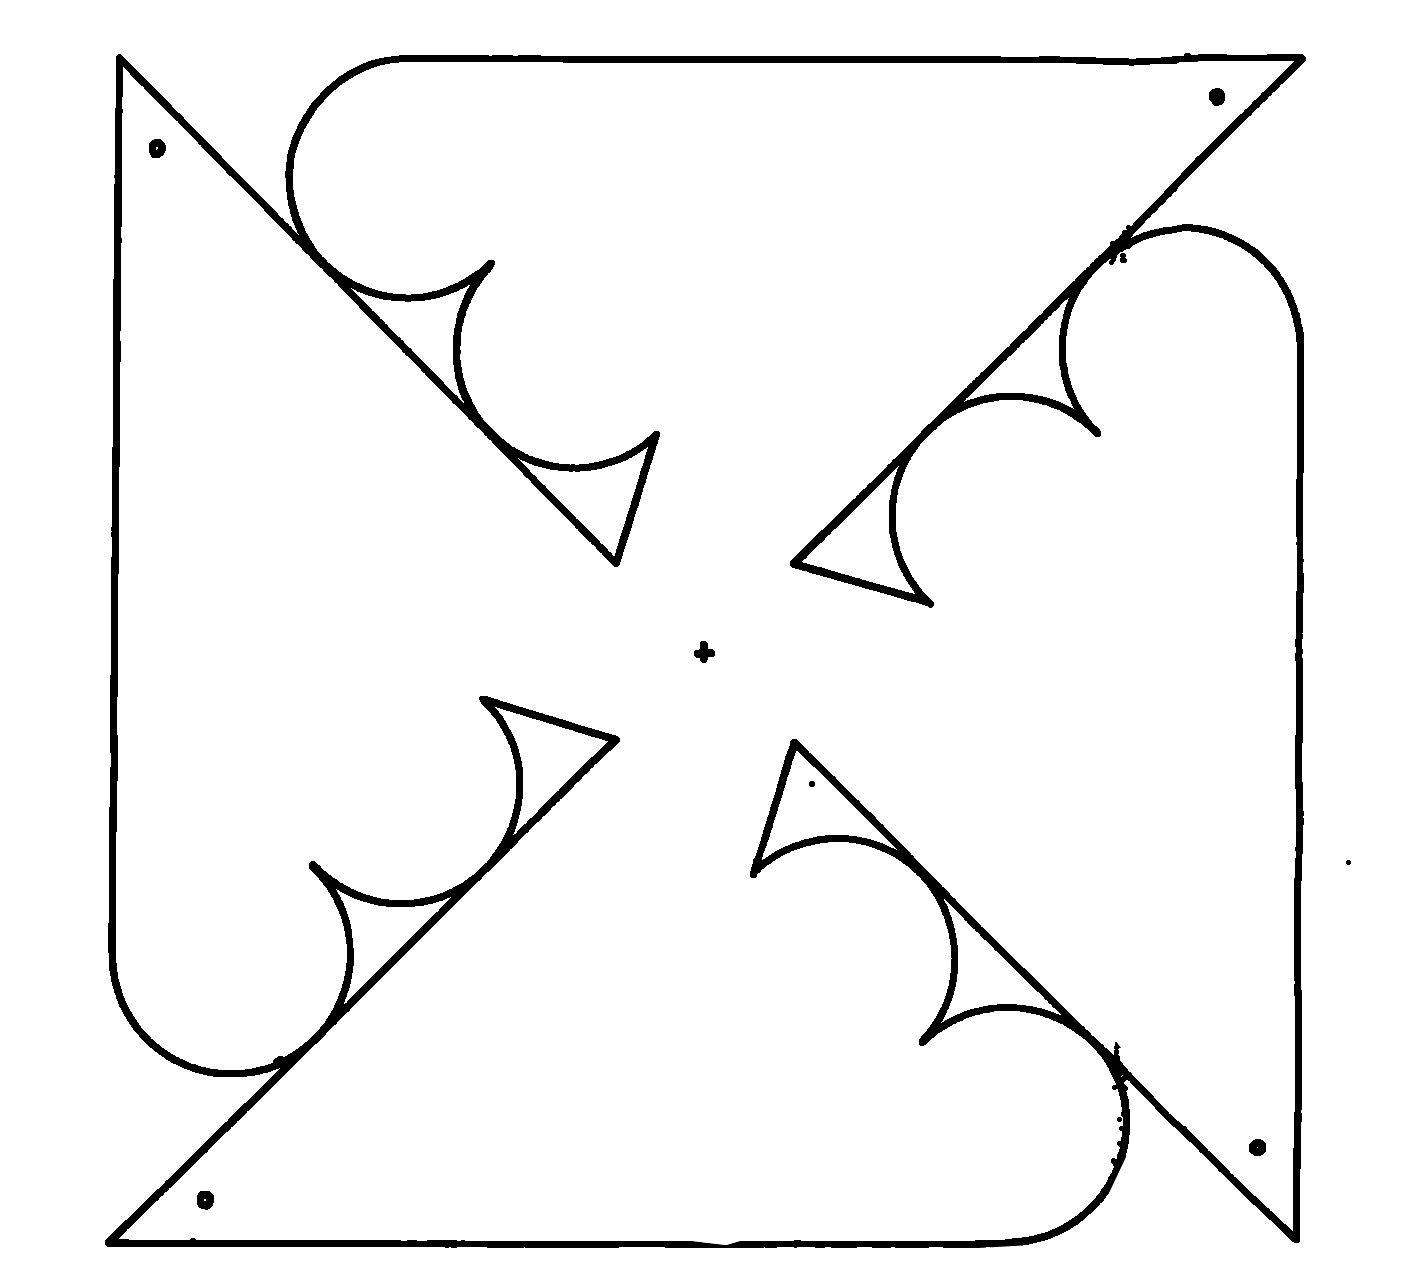 pinwheel | Plantillas (Moldes) | Pinterest | Las mandalas, Las horas ...